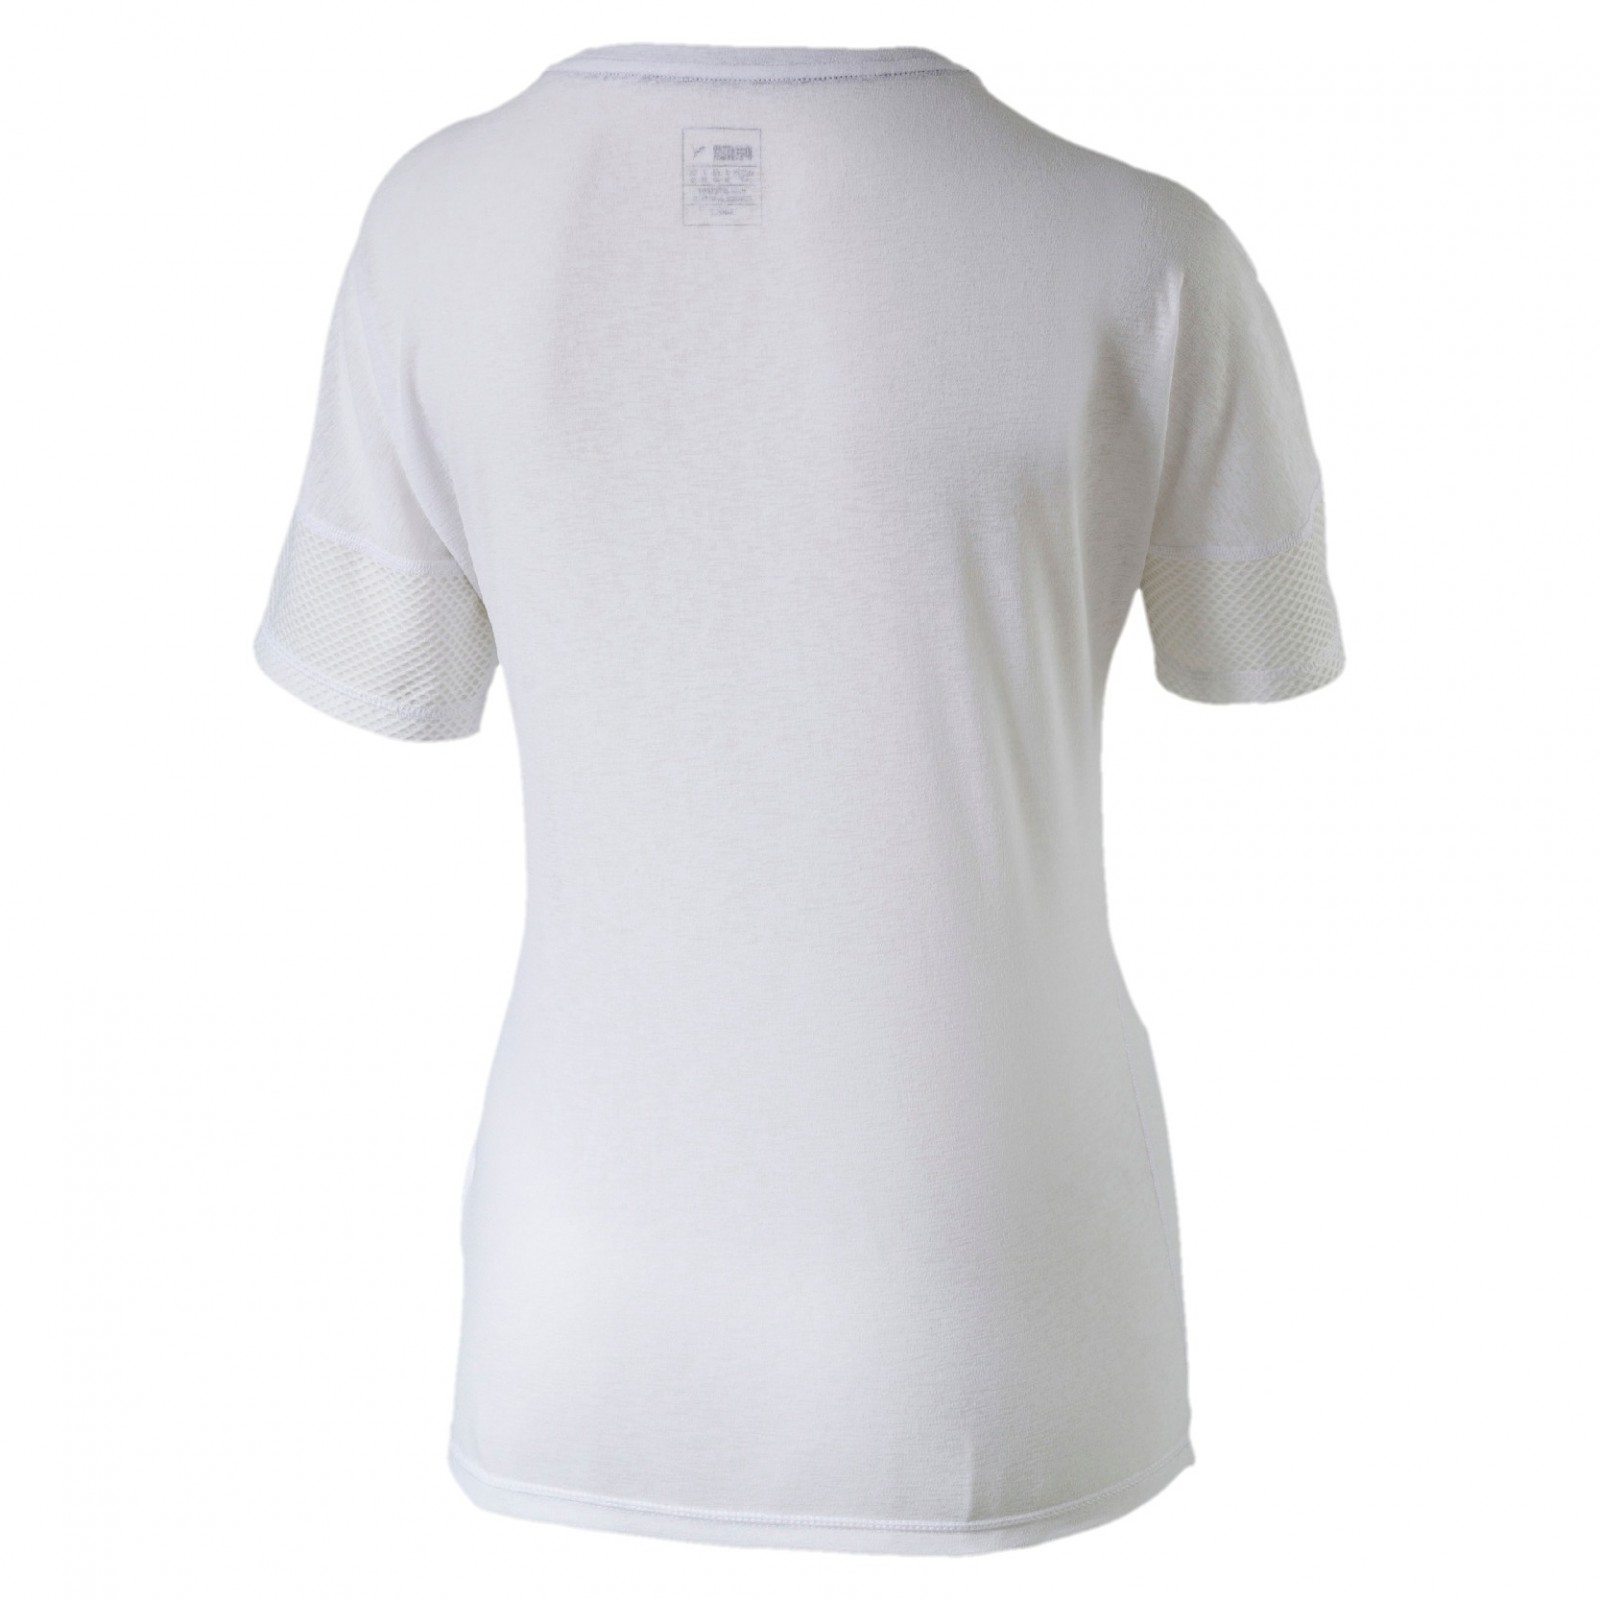 Dámské Tričko Puma Loose Tee White  008ef19b936